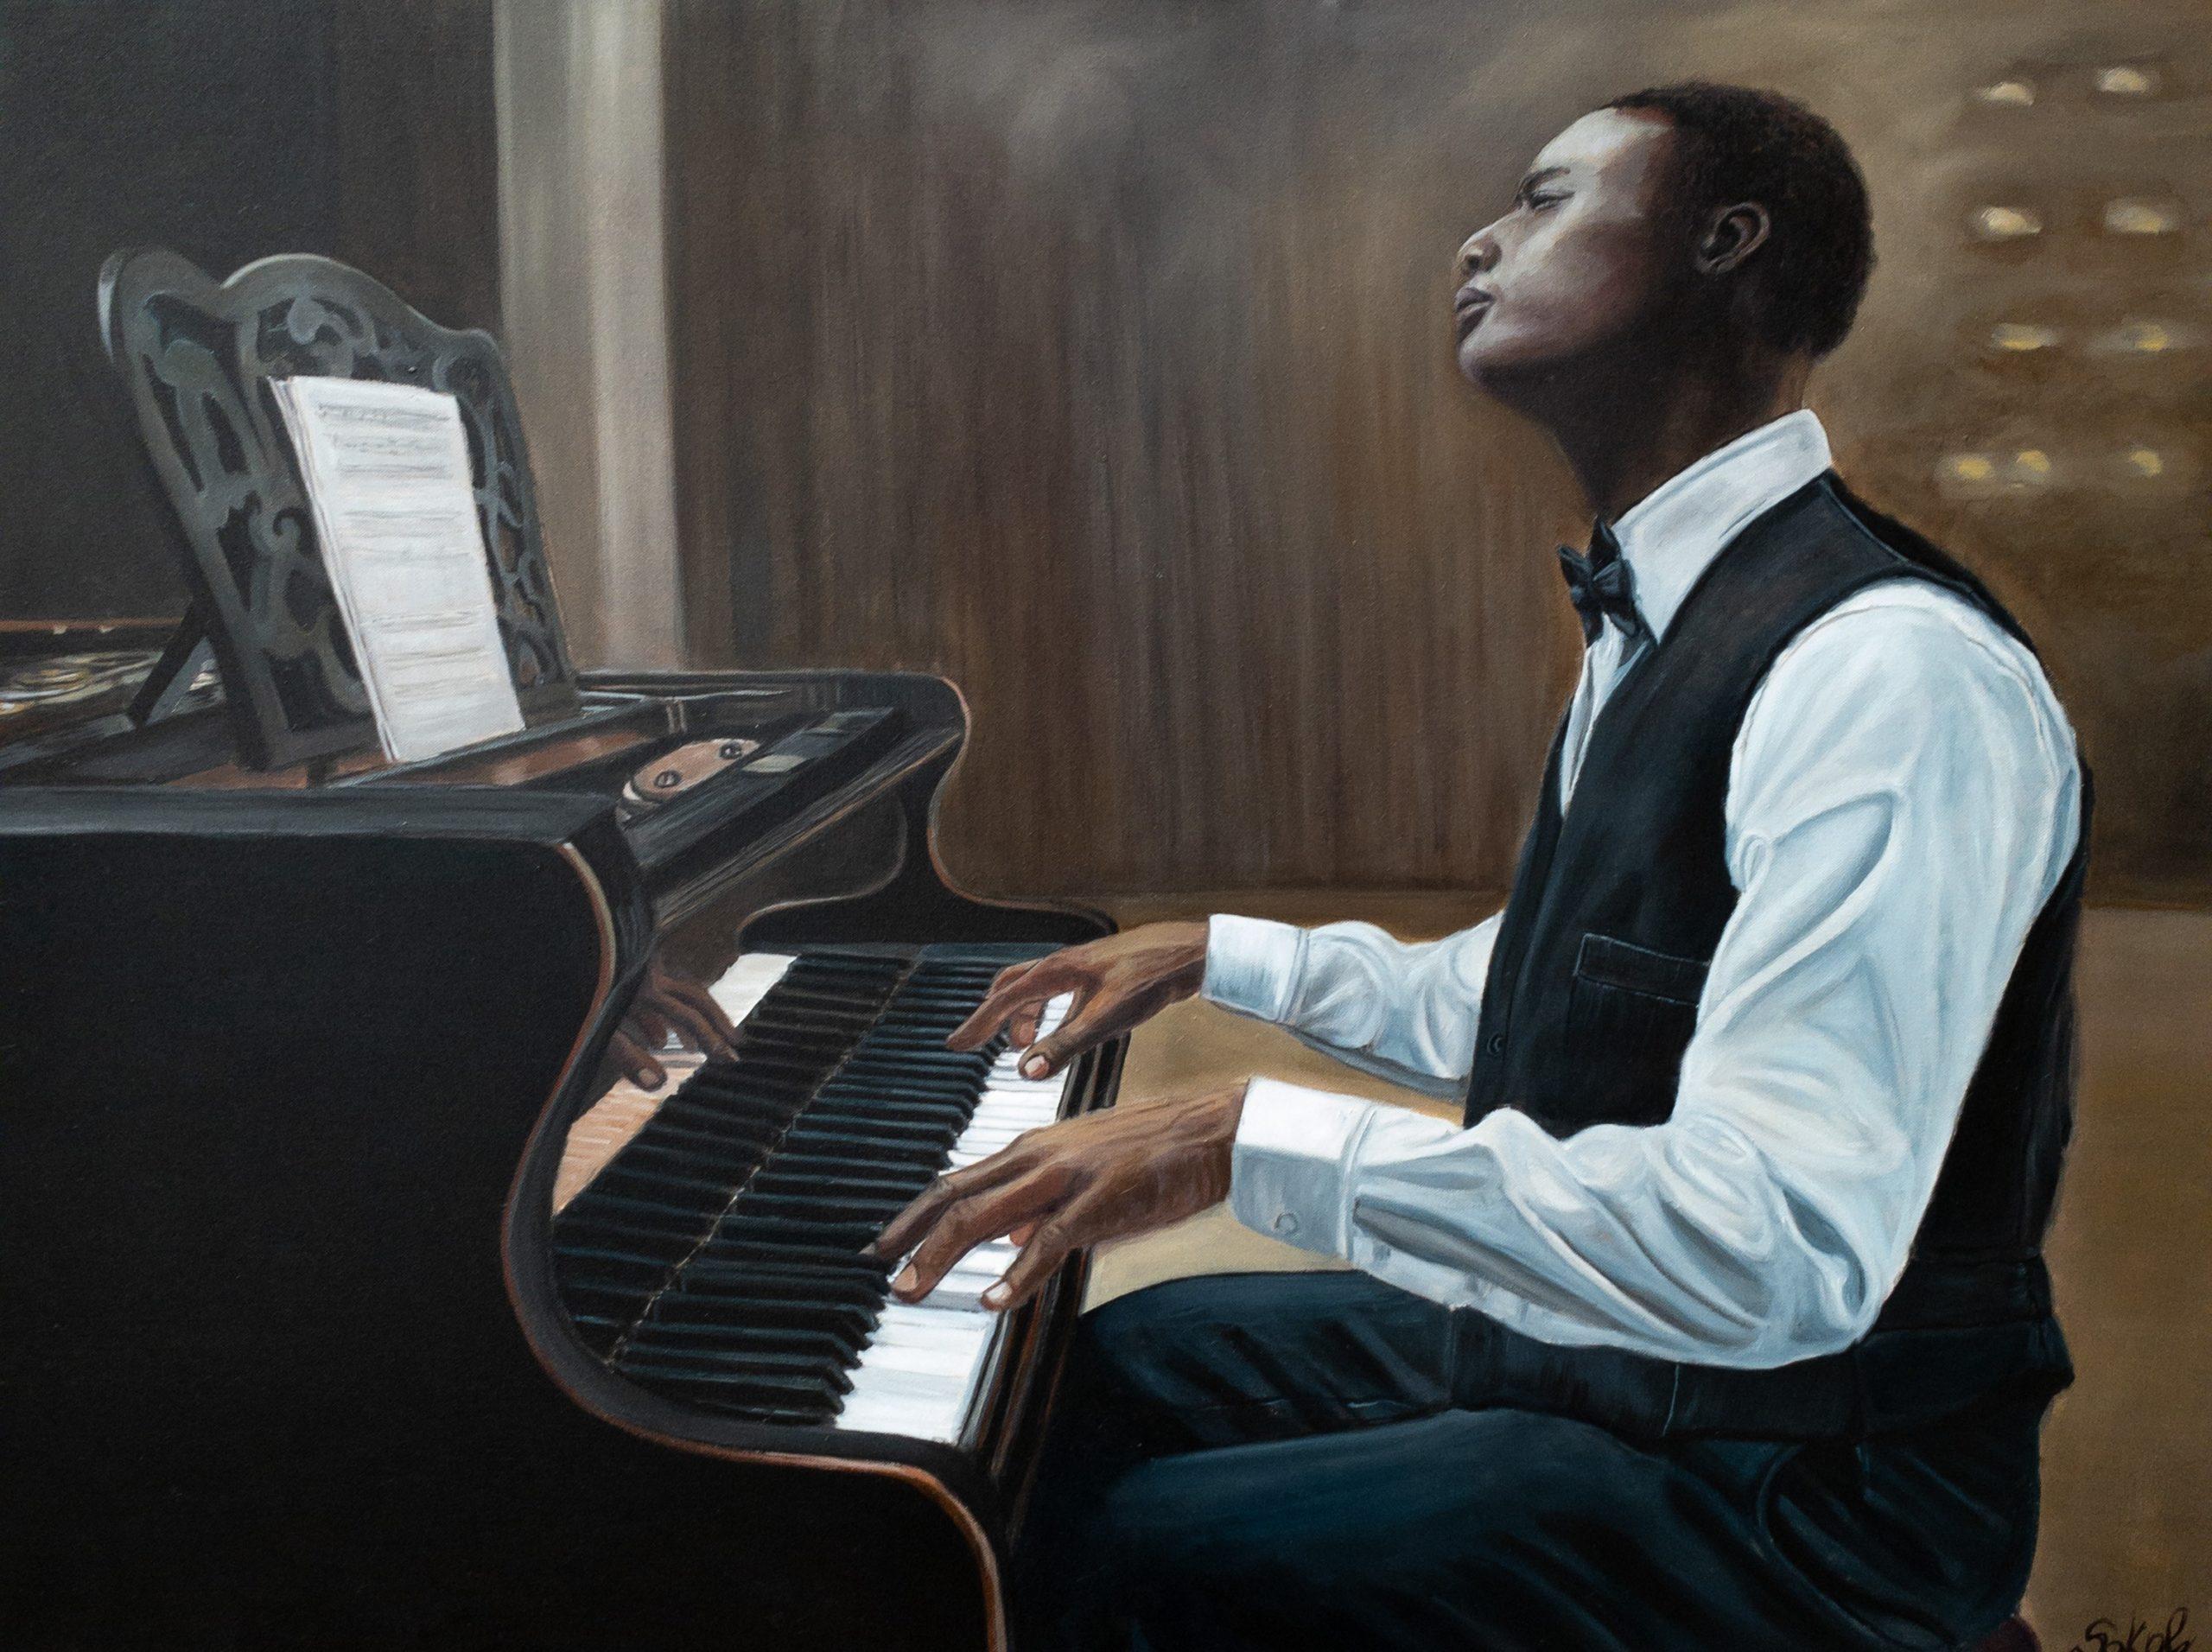 The Pianist by Kinga Sokol